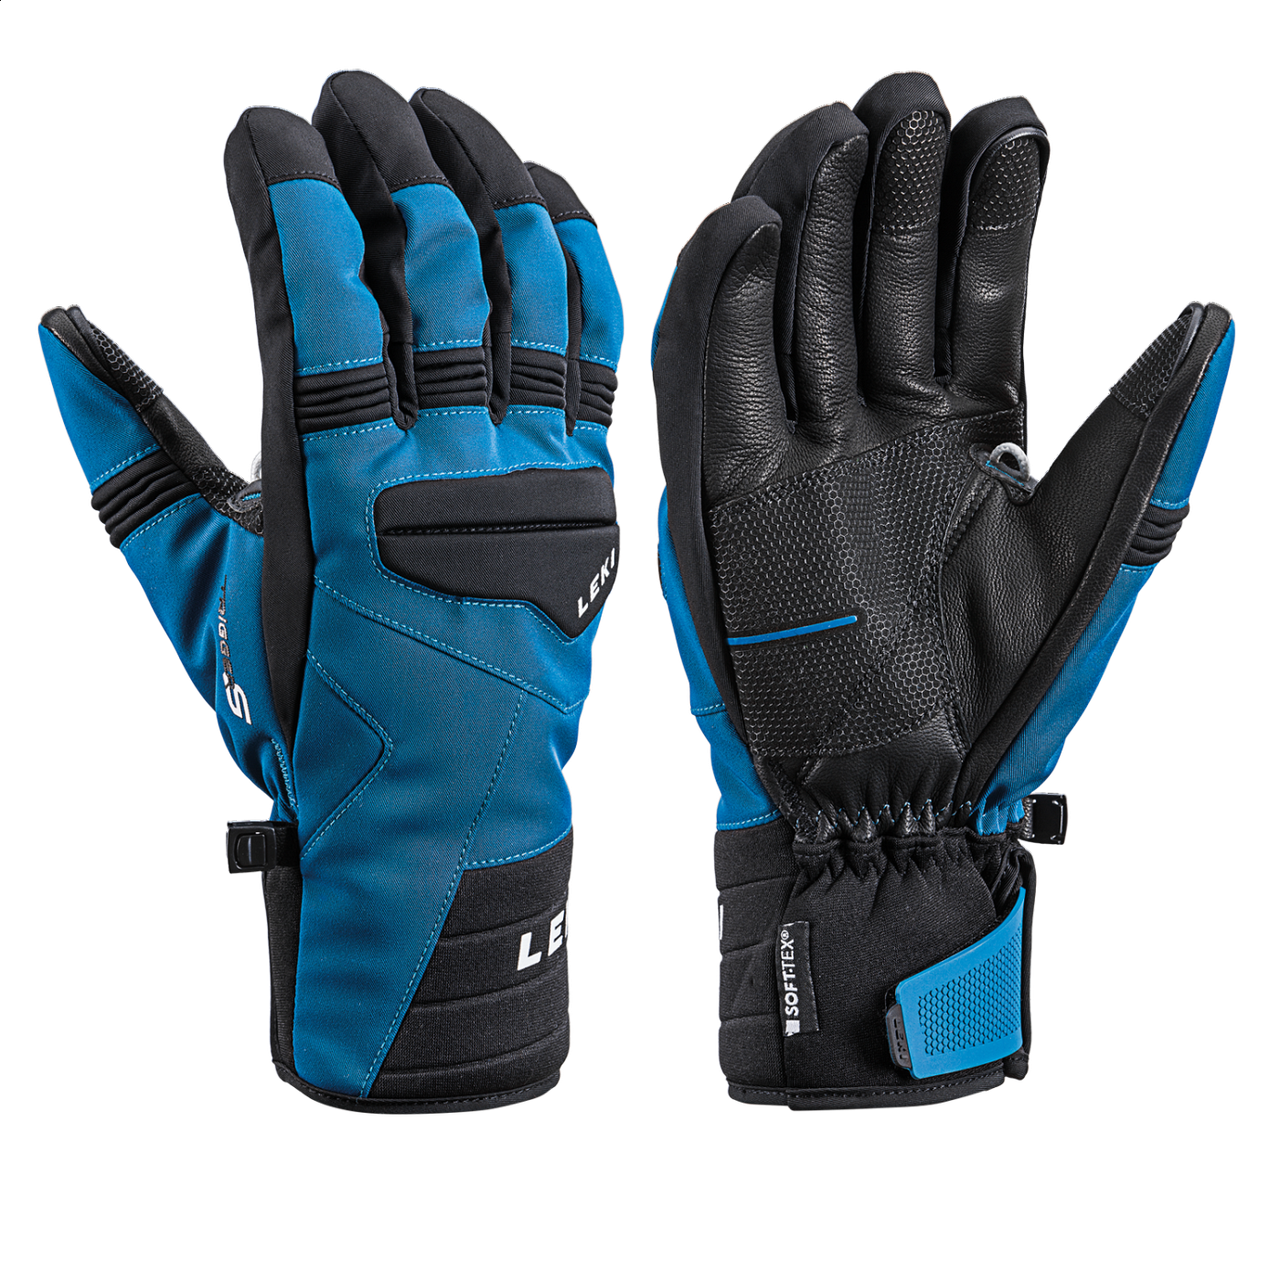 Перчатки Leki Progressive 9 S mf touch